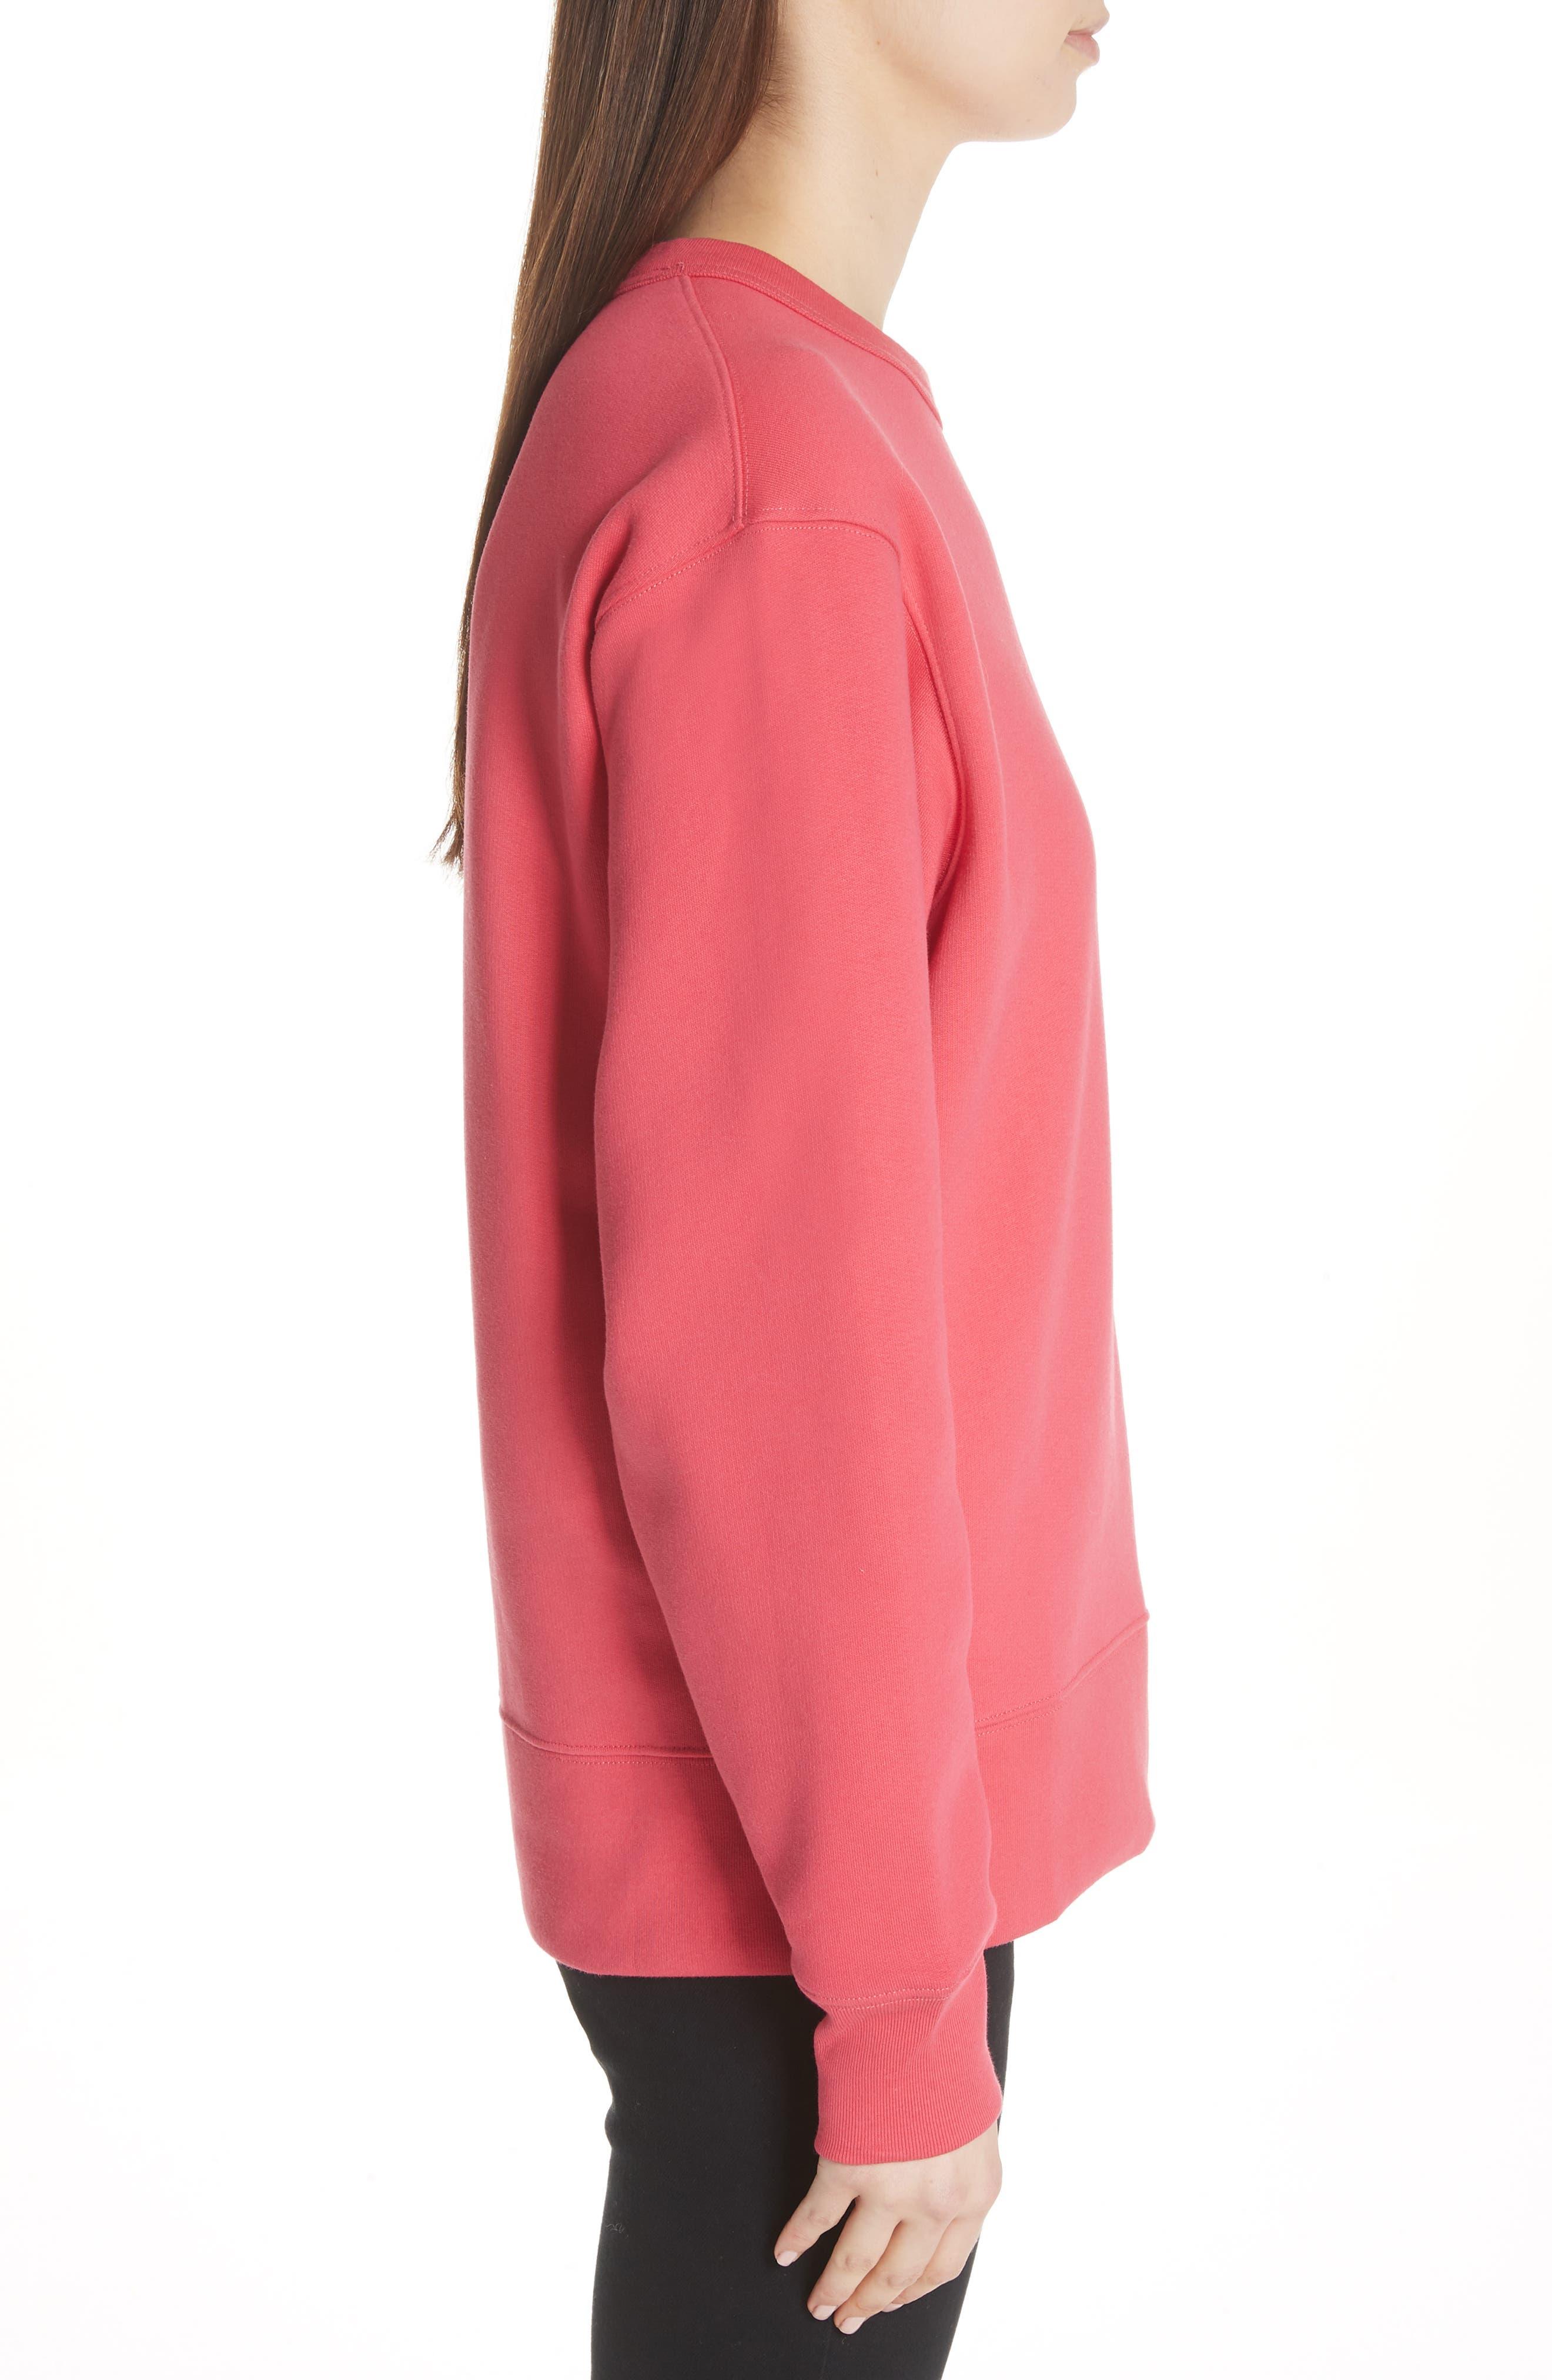 Fairview Crewneck Sweatshirt,                             Alternate thumbnail 3, color,                             Neon Pink